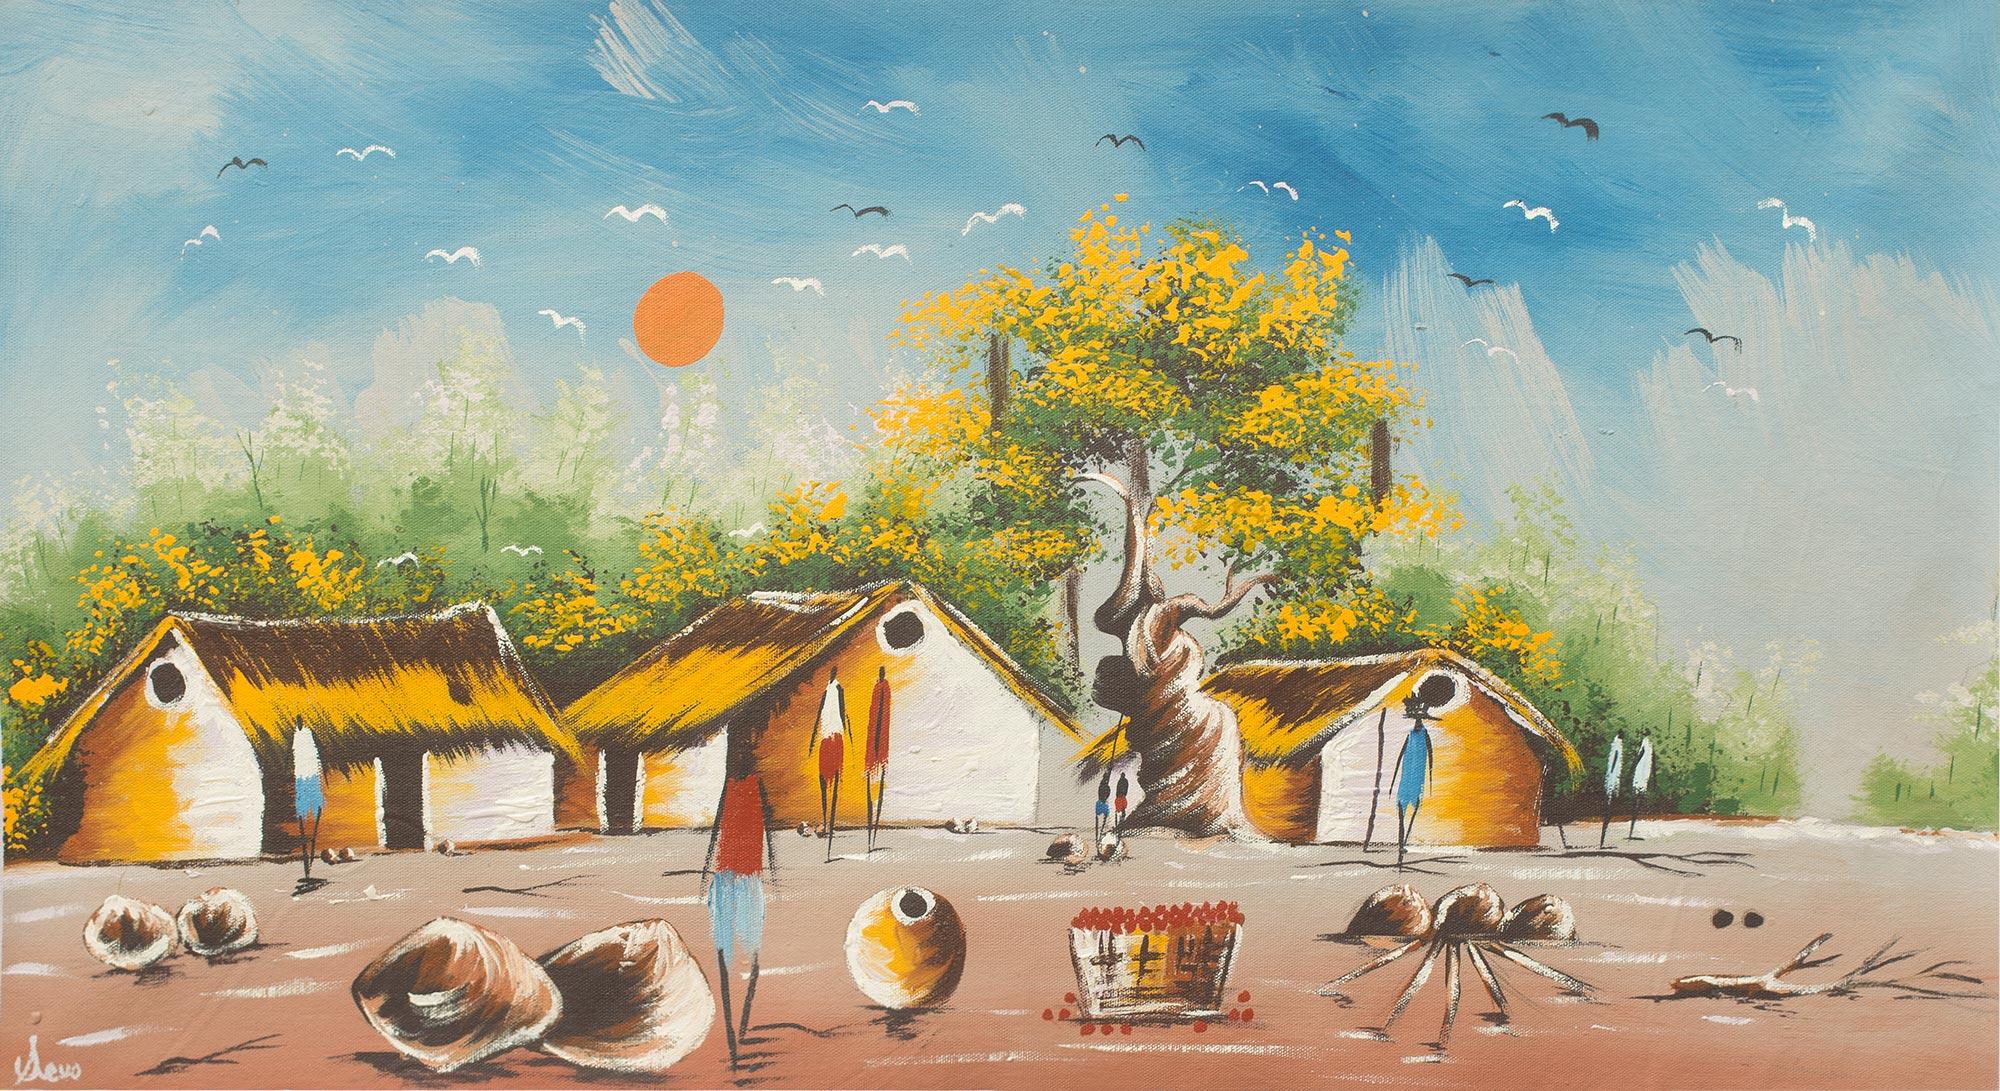 Unicef UK Market | Original Painting of African Village ...